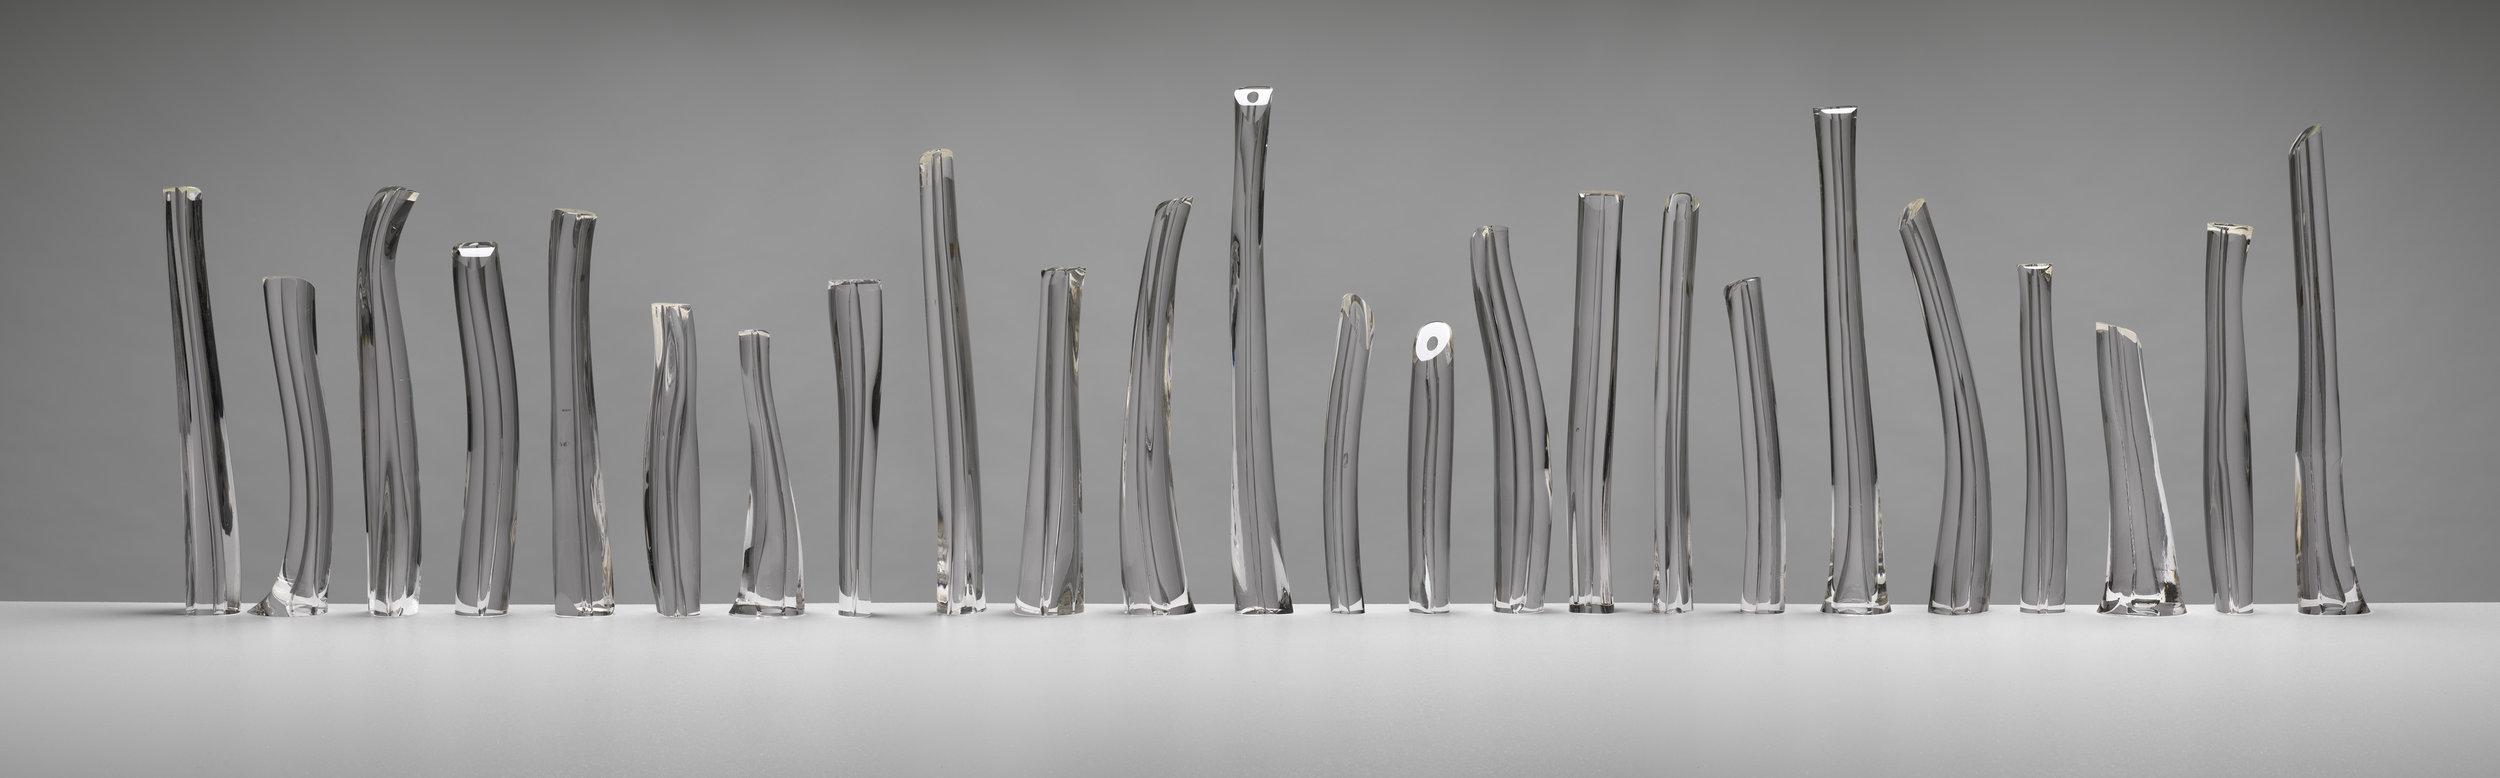 Bones, 2007